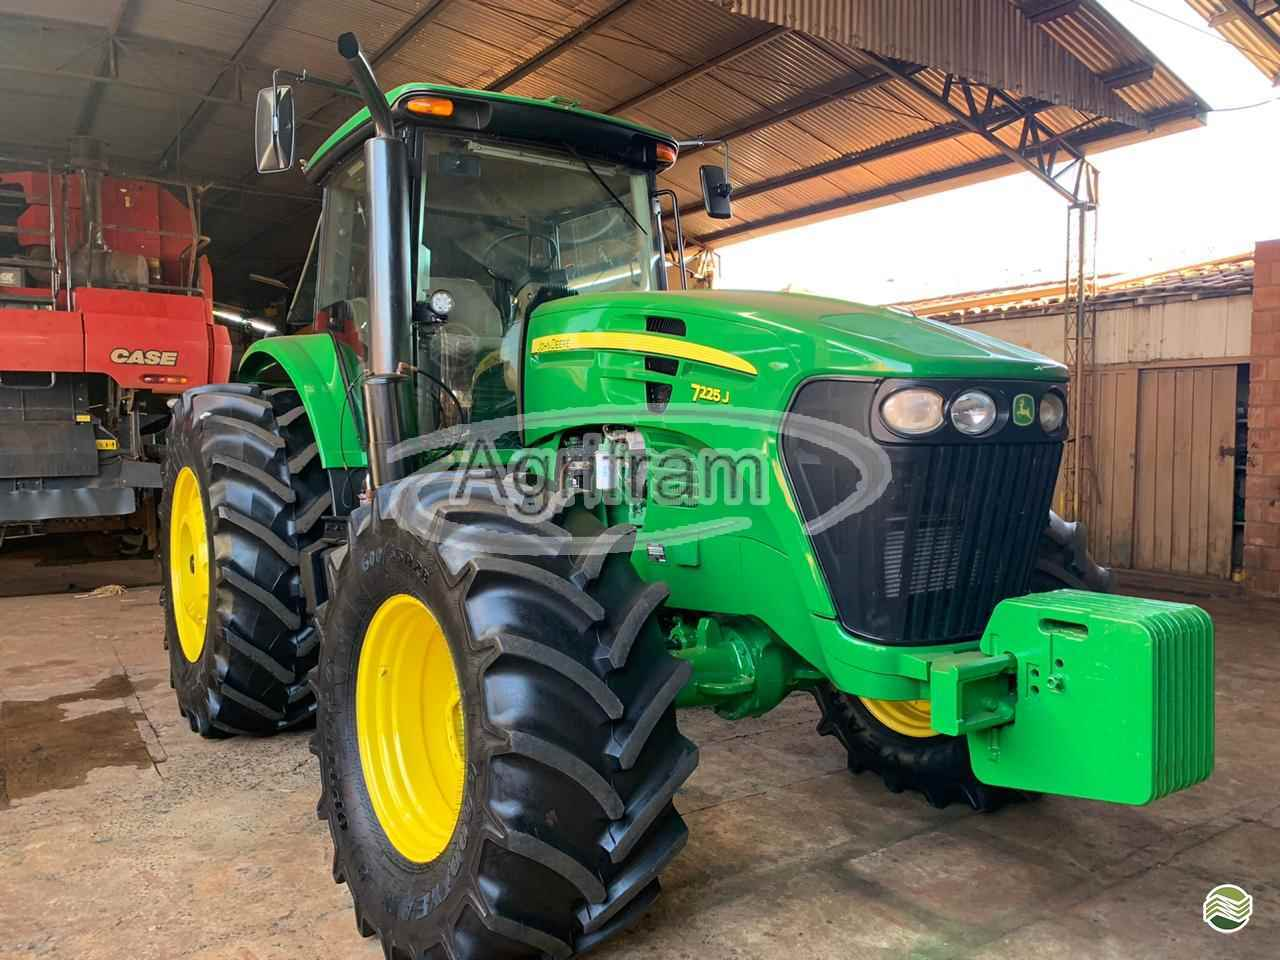 JOHN DEERE JOHN DEERE 7225  2014/2014 Agrifram Máquinas e Soluções Agrícolas